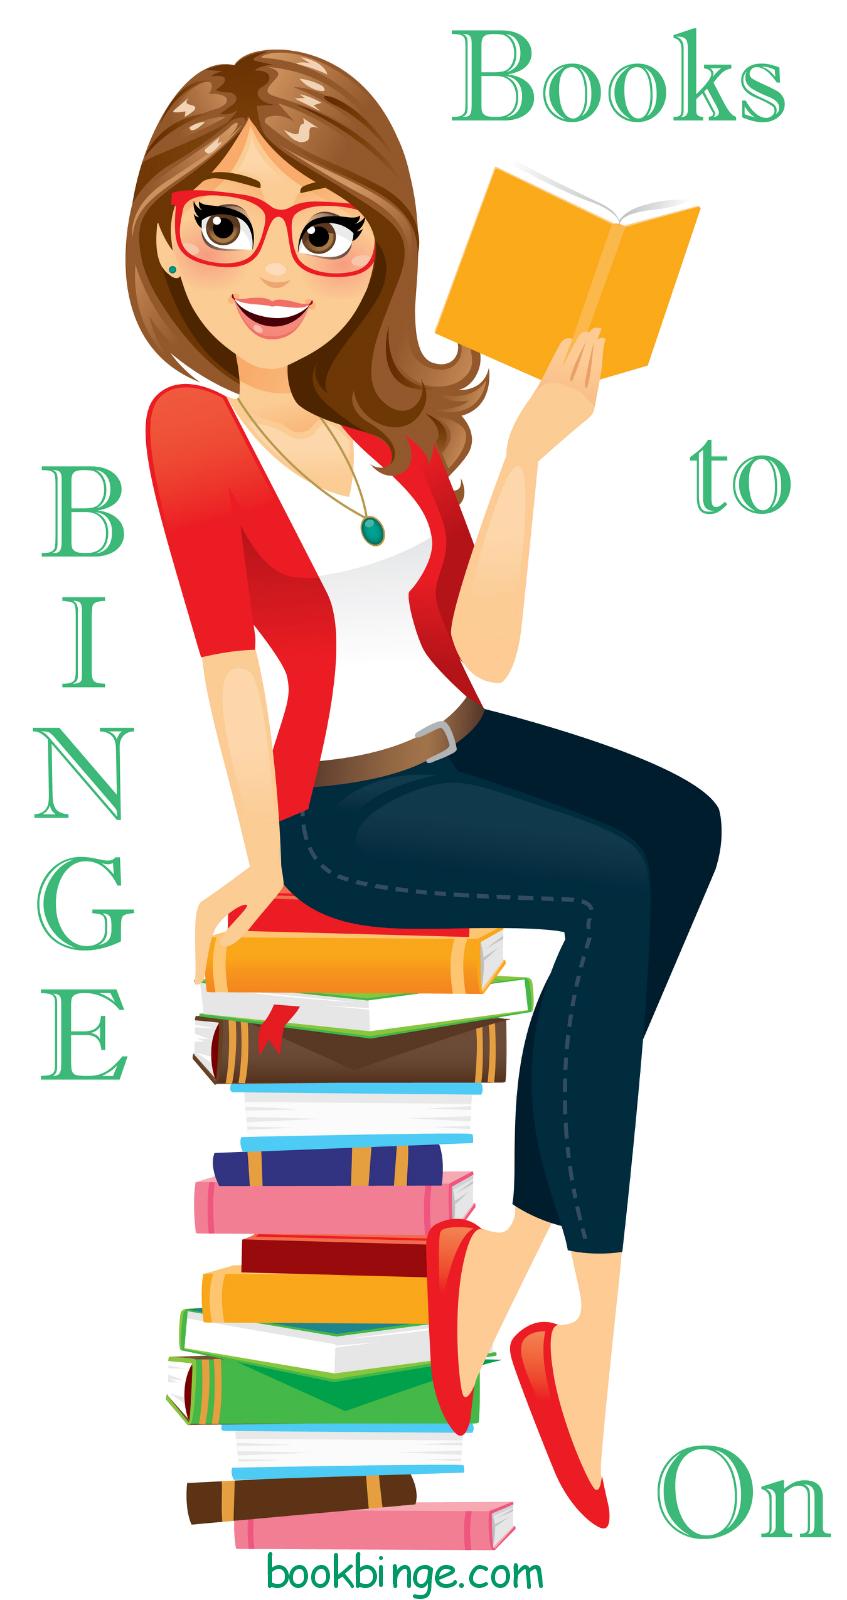 Books to Binge On | Book Binge